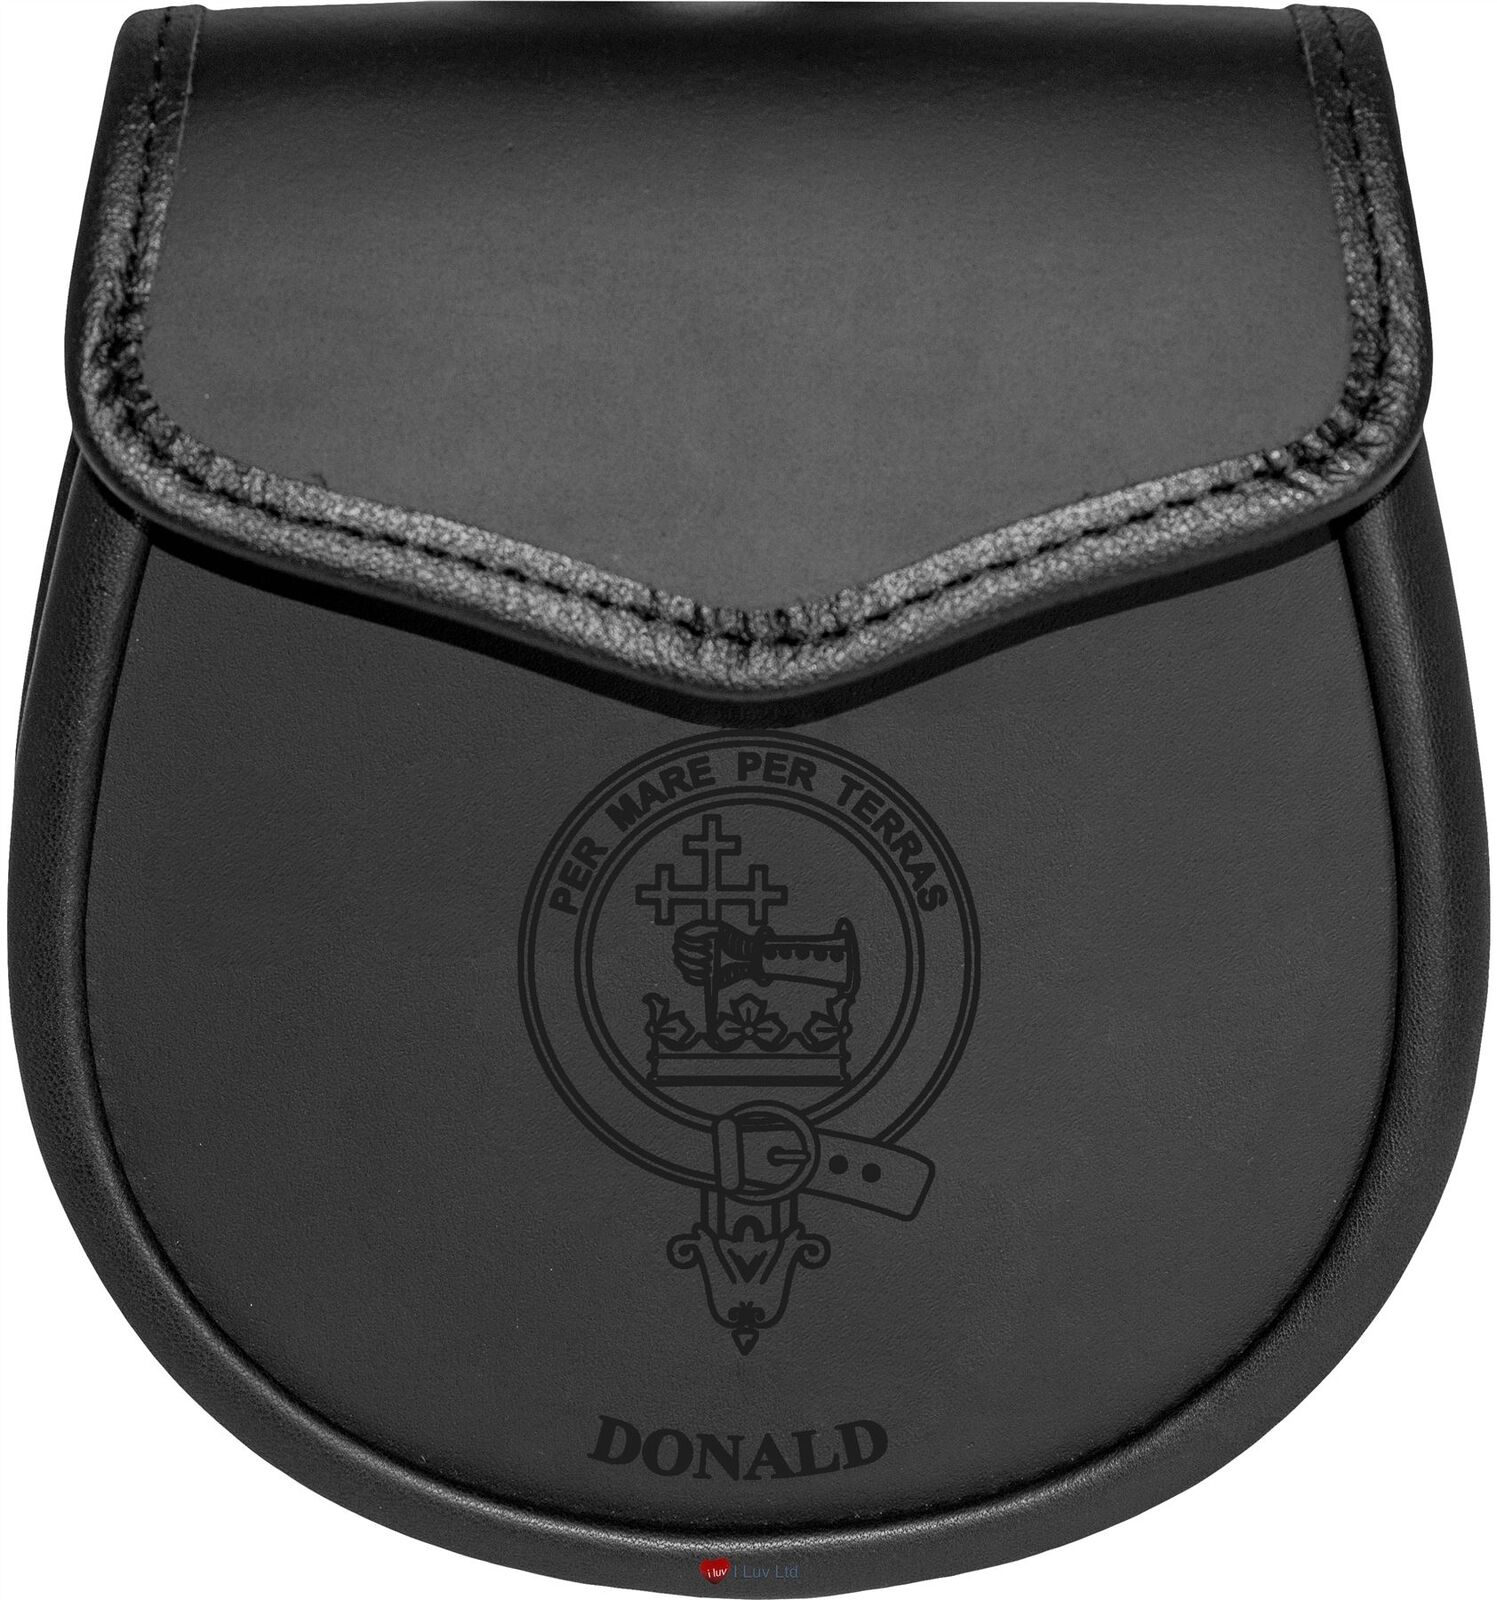 Donald Leather Day Sporran Scottish Clan Crest